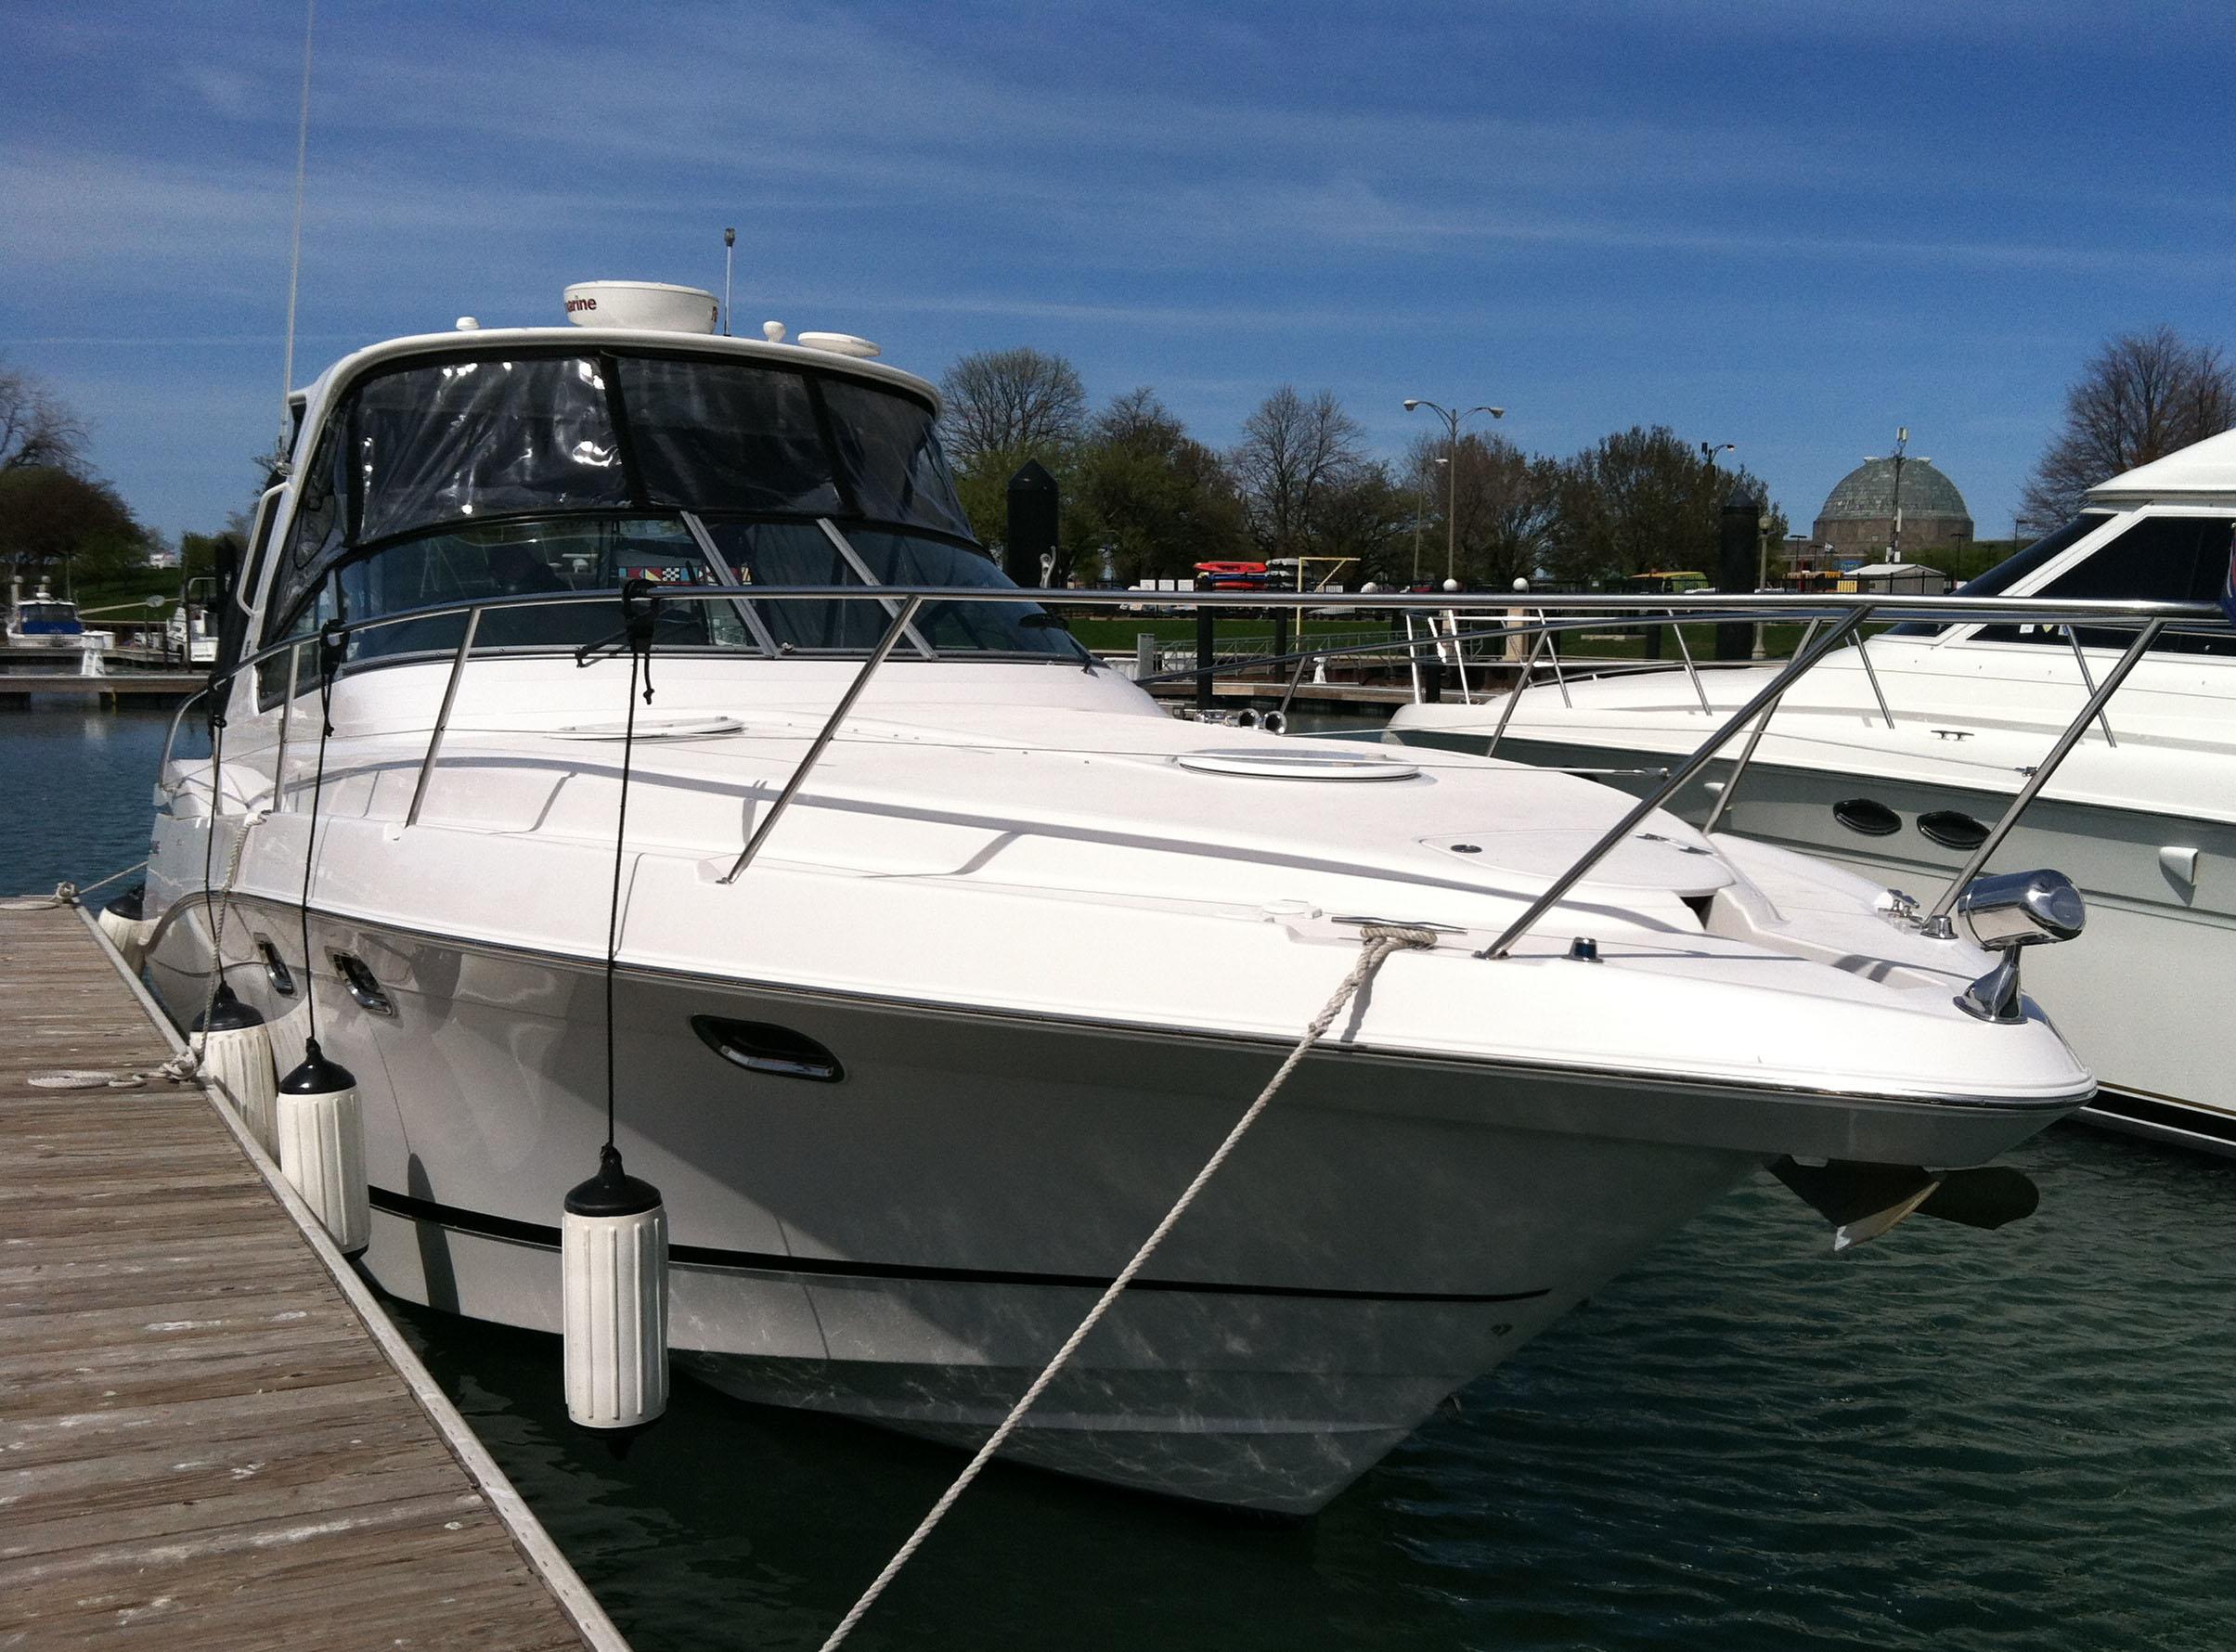 coast-yacht-charter-fourwinns-v378-vista-2.jpg